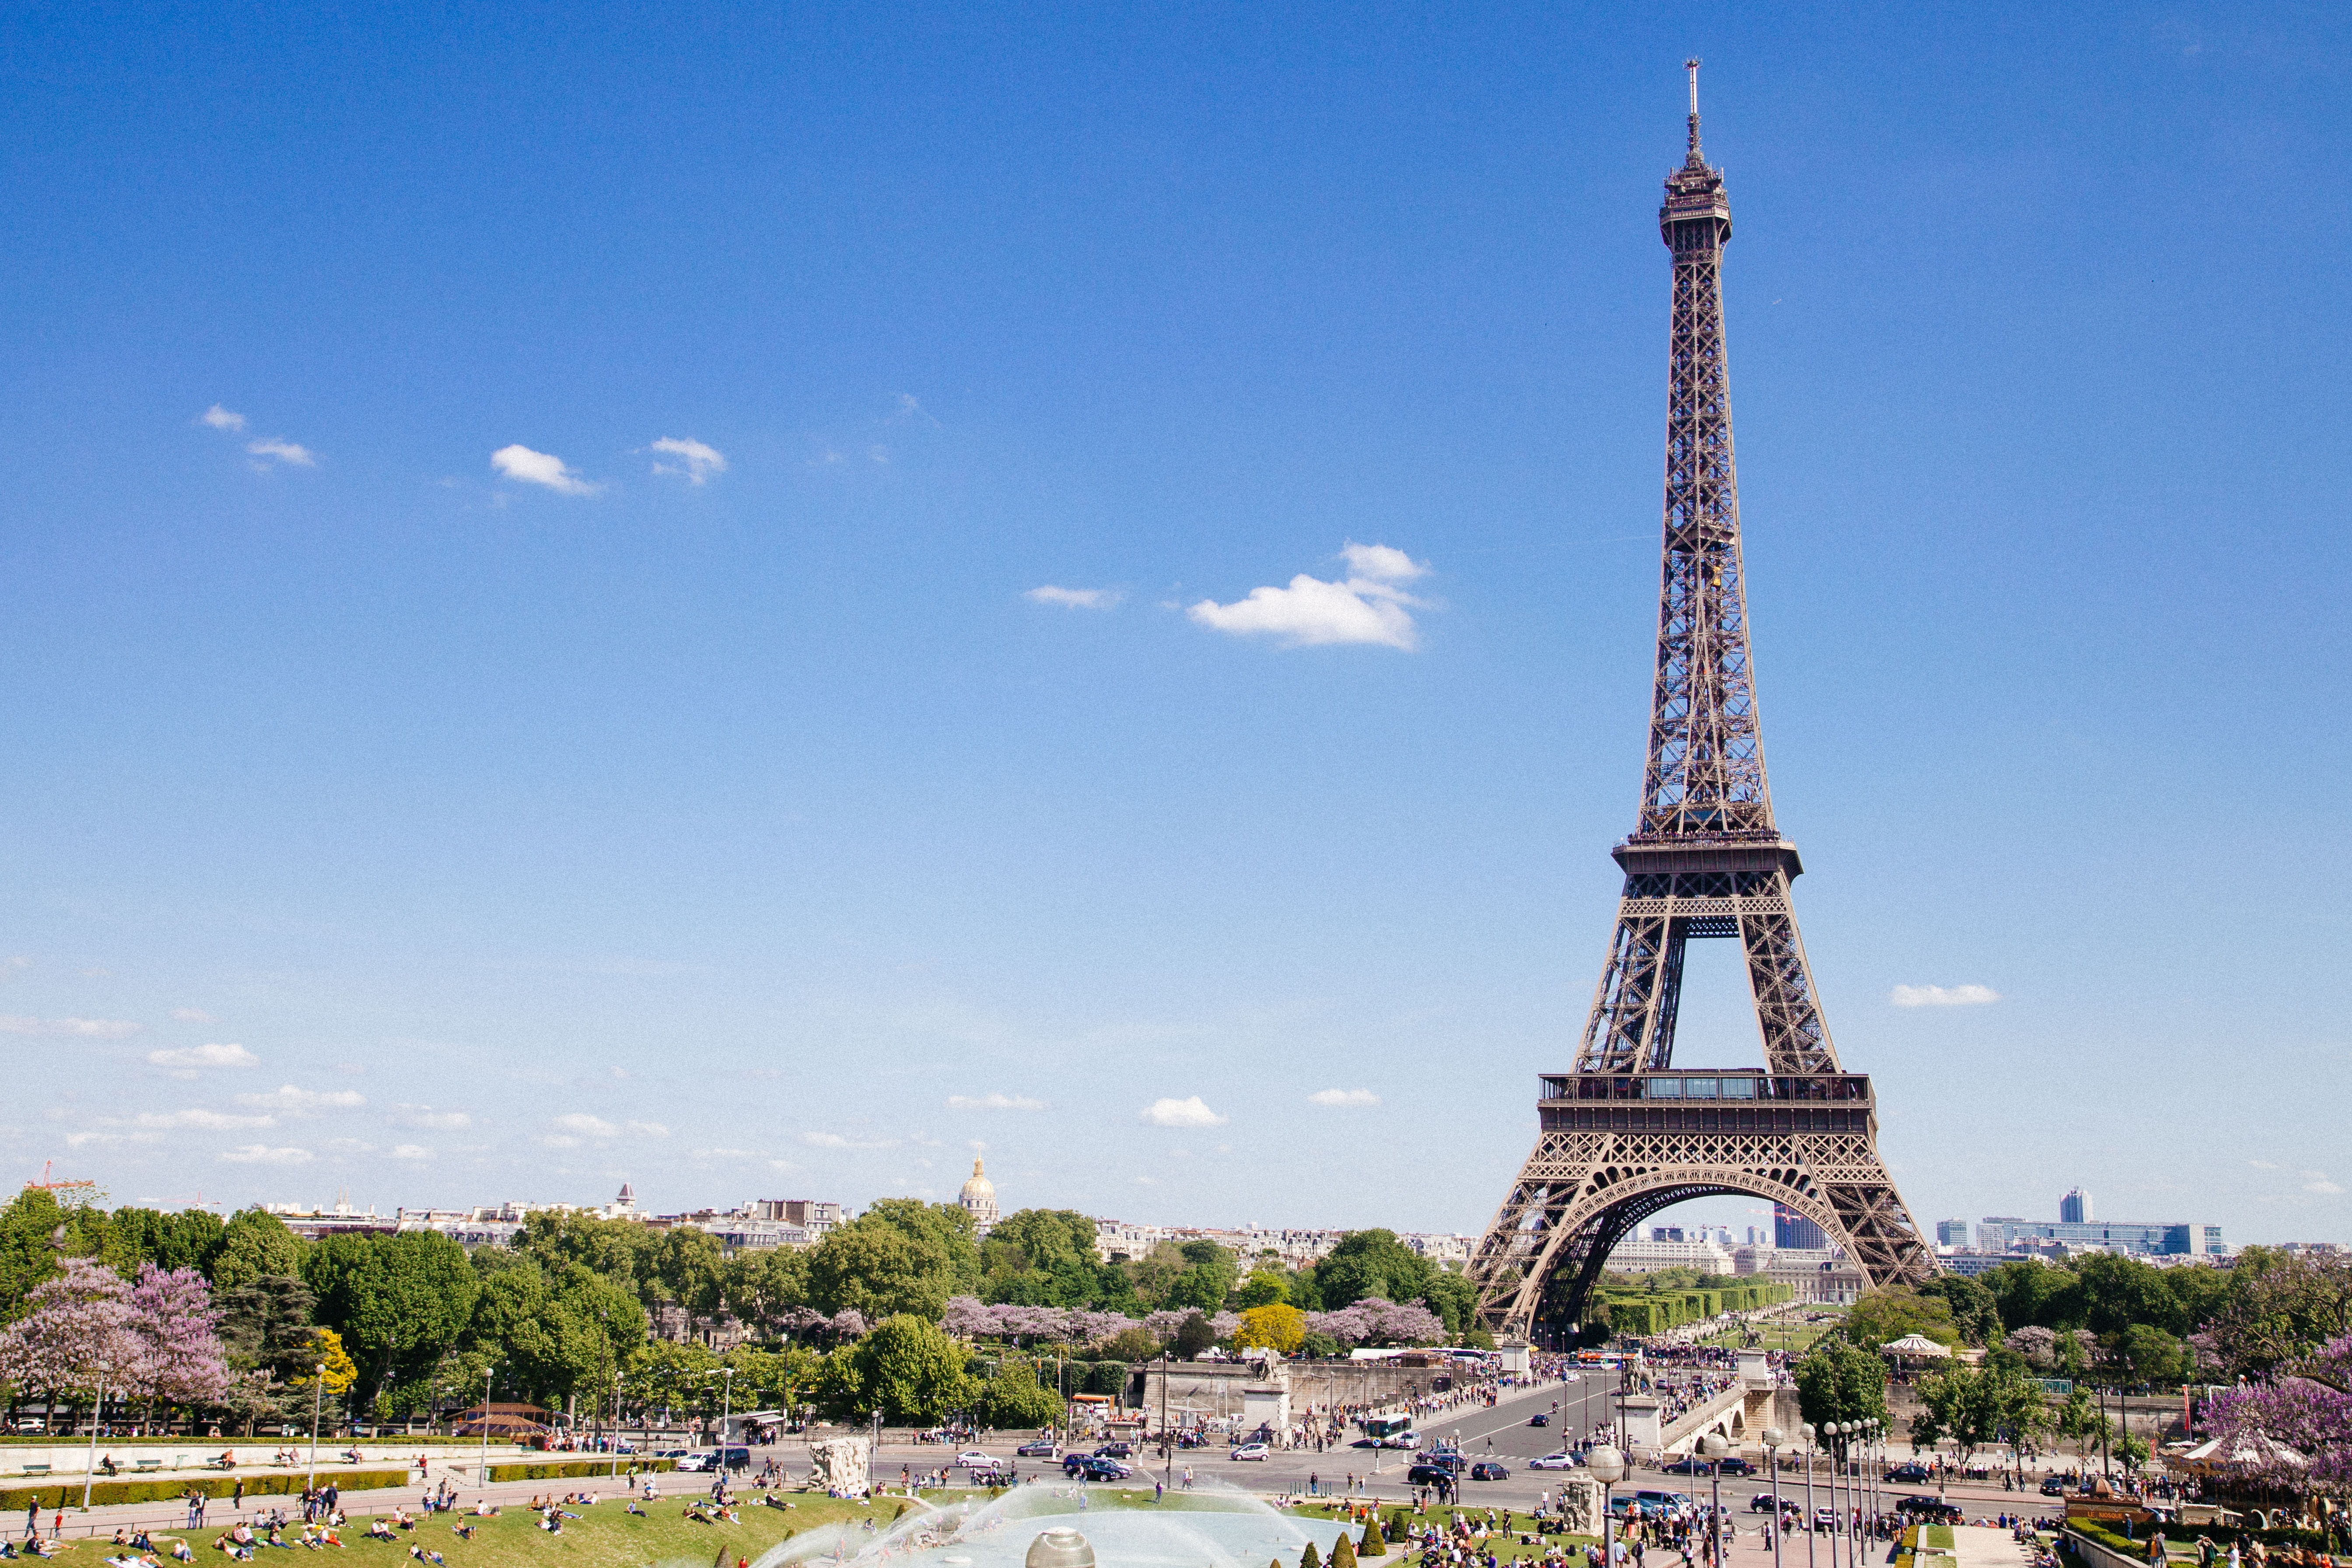 Paris Eiffel Tower, France in August